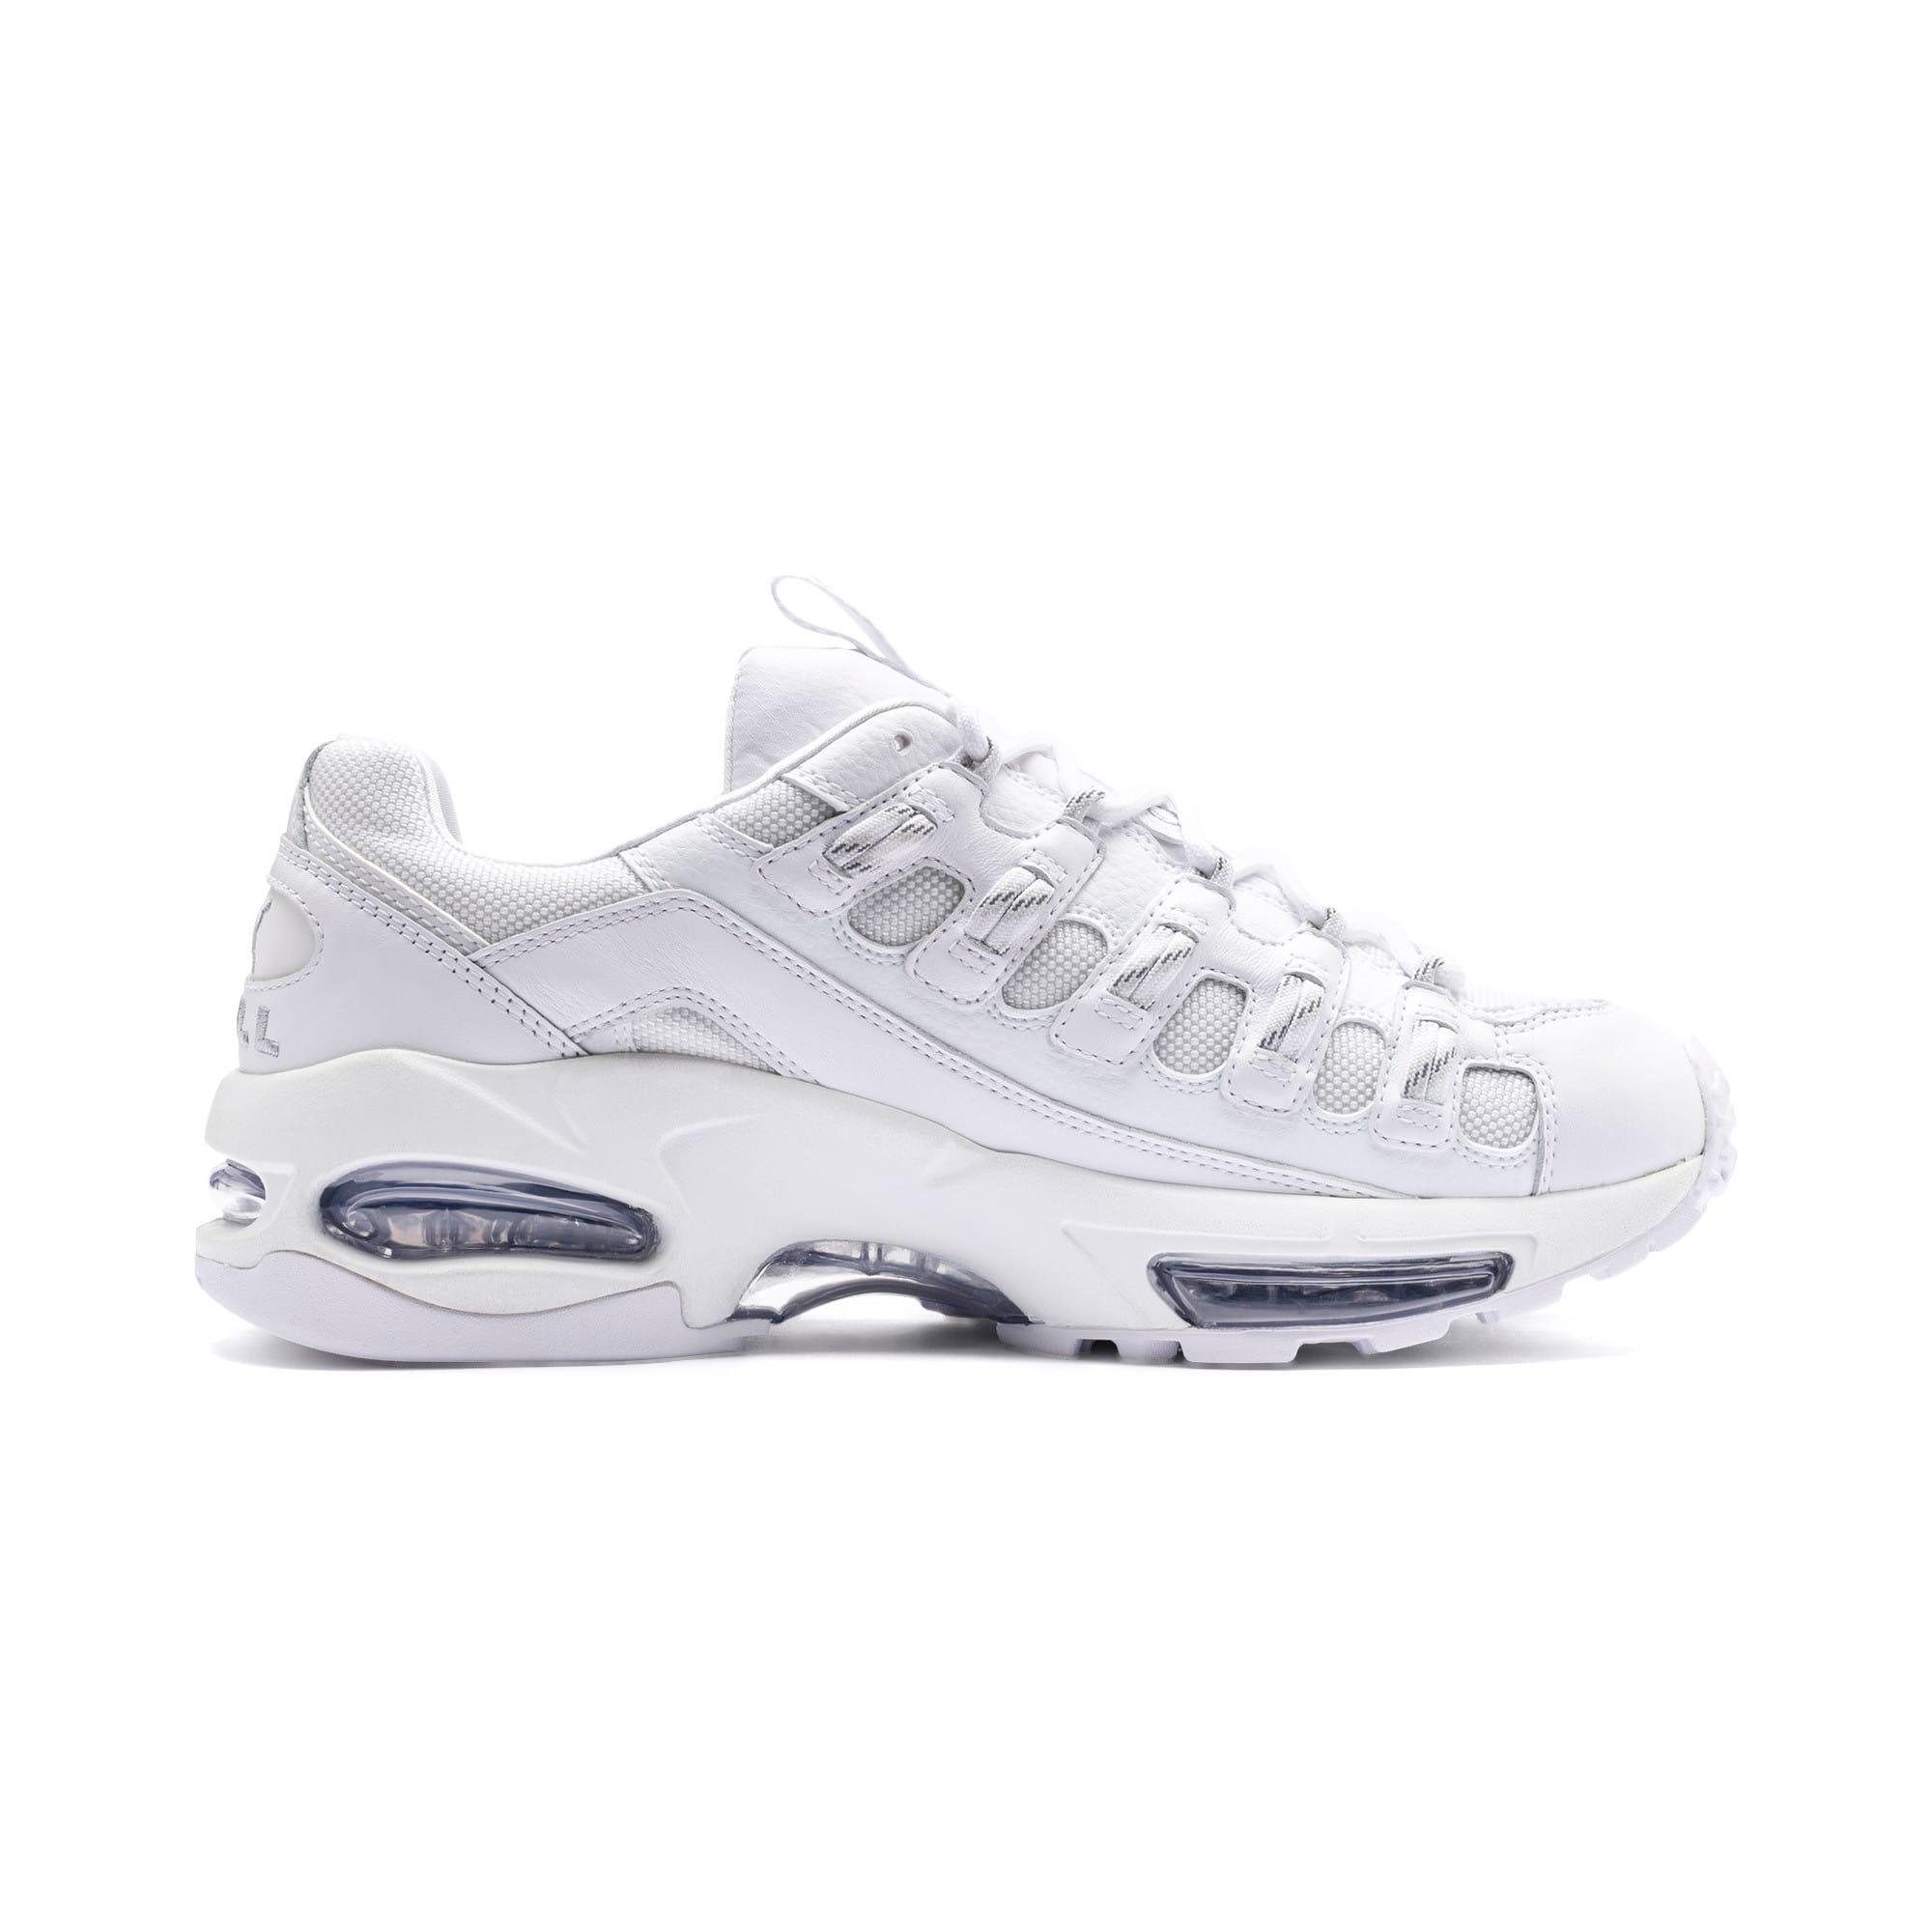 Thumbnail 6 of CELL Endura Rebound Sneaker, Puma White-Puma White, medium